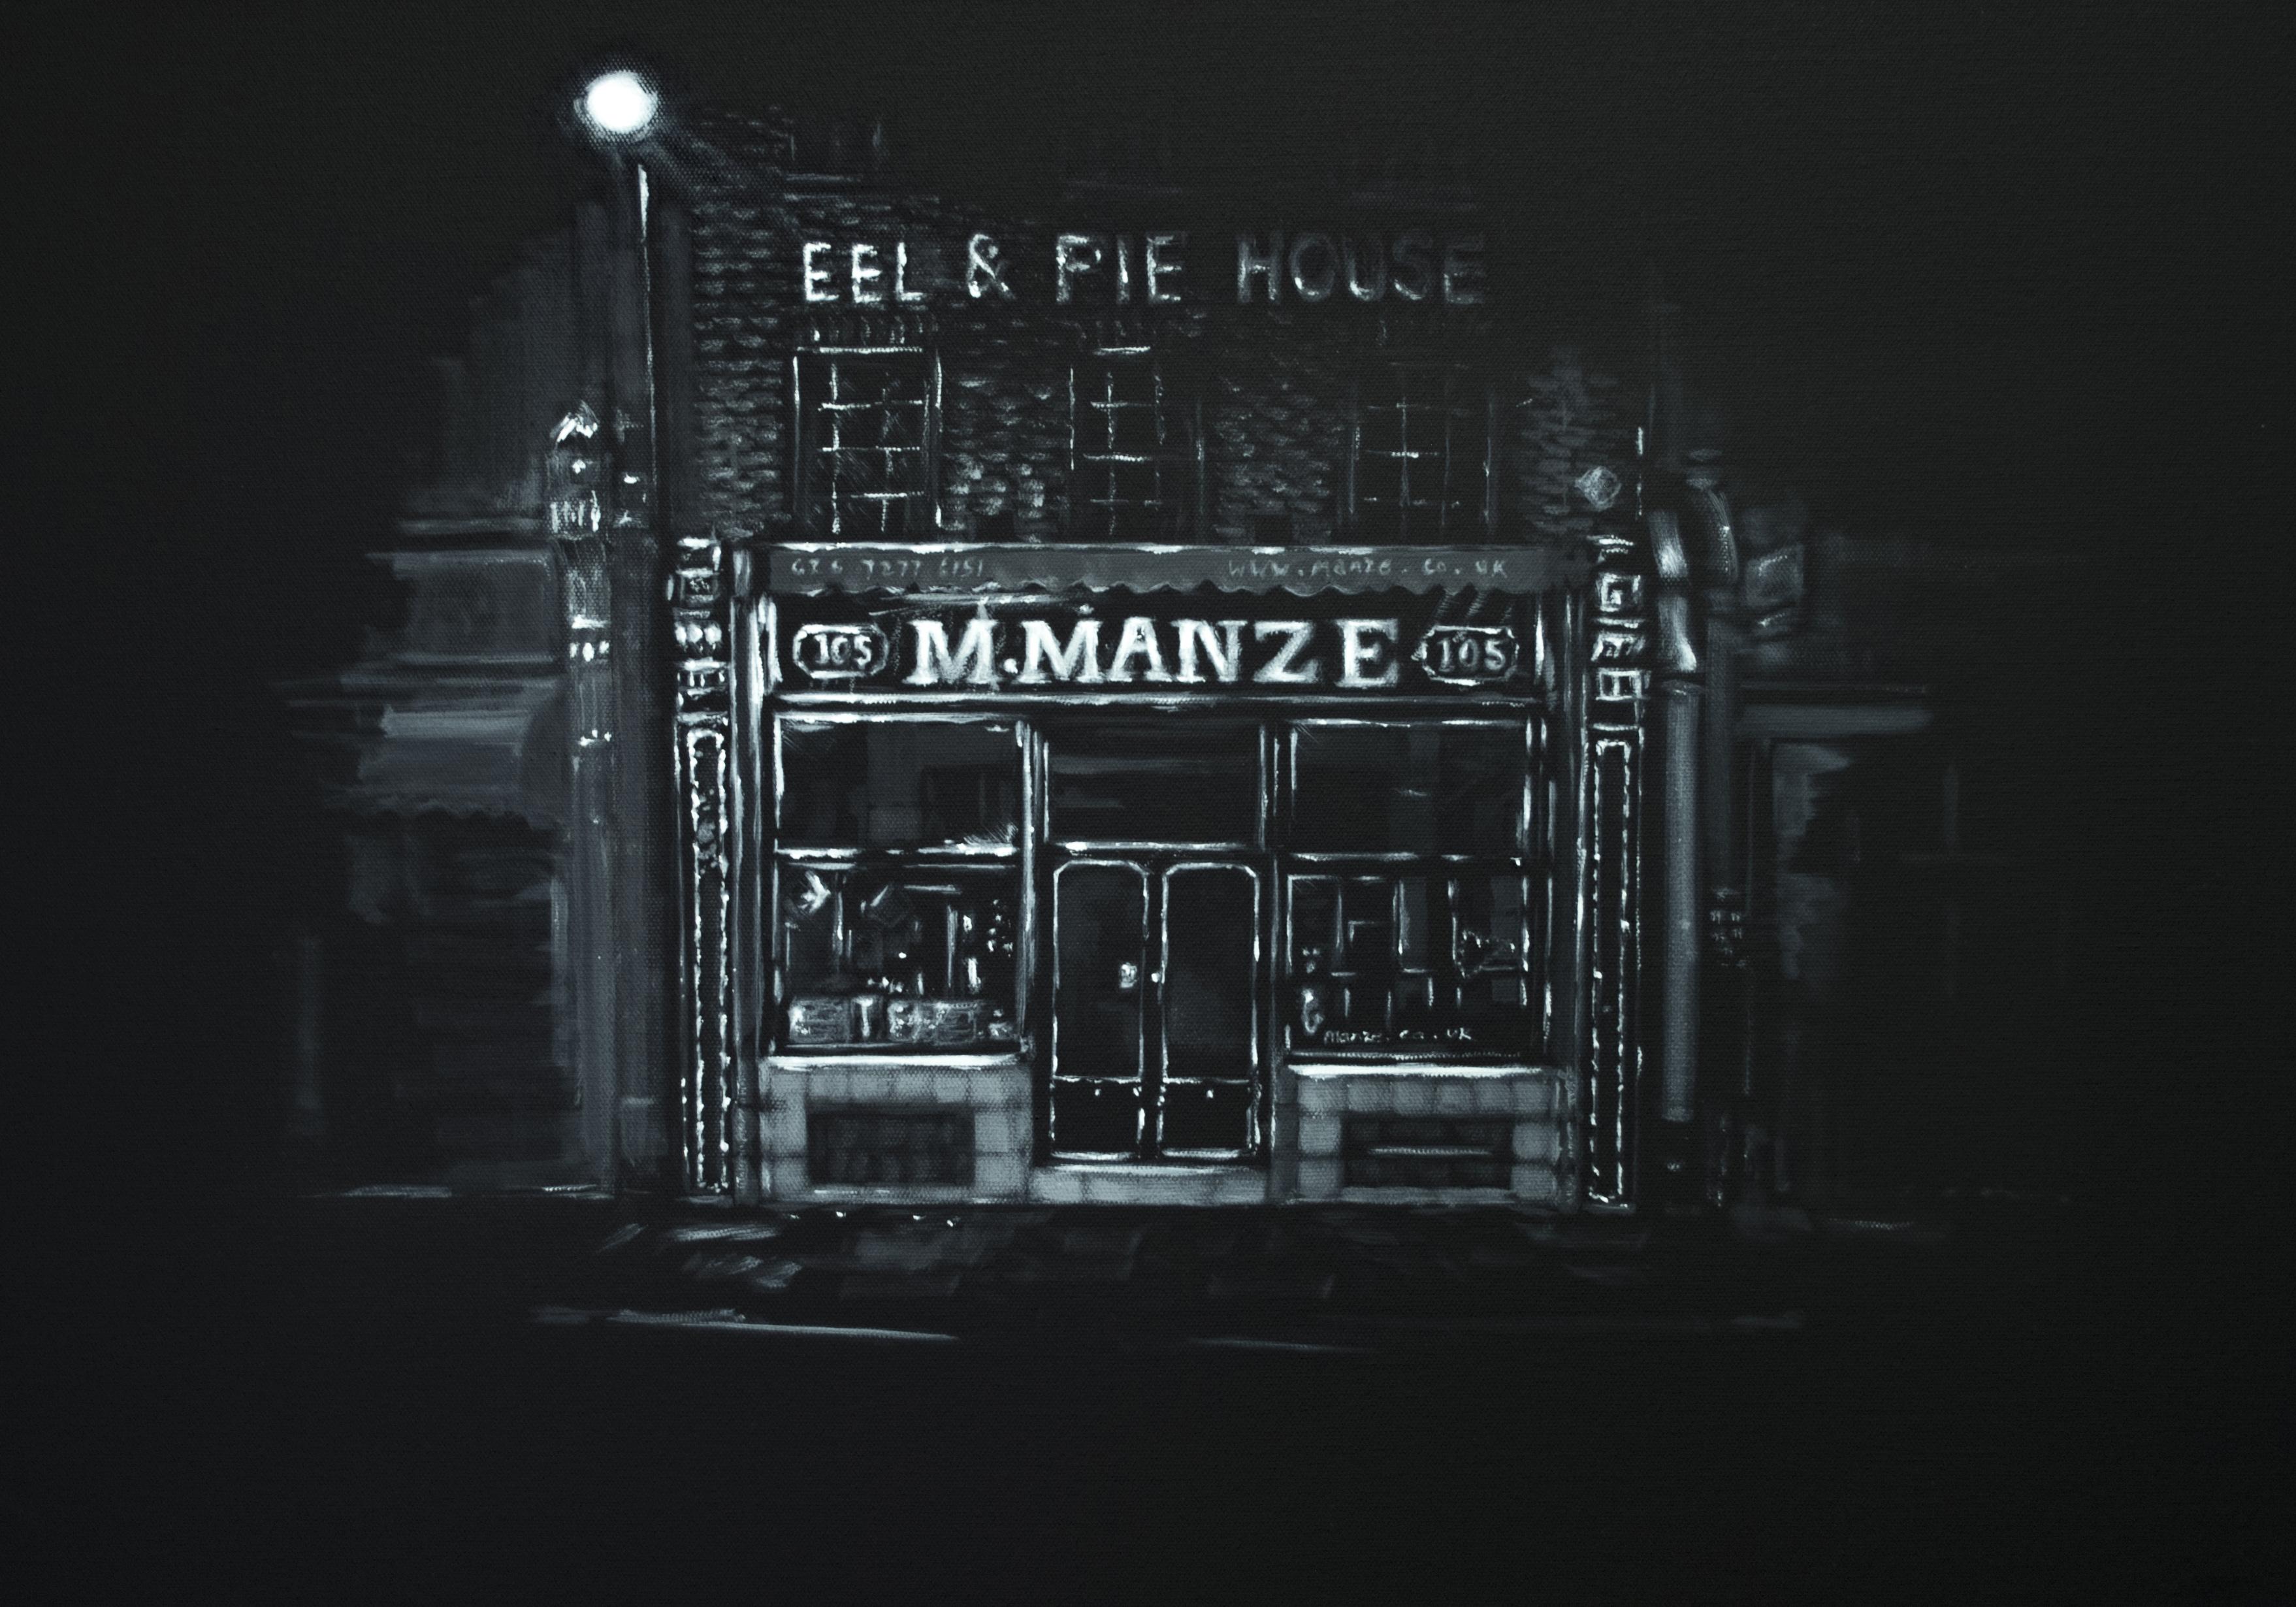 M.Manze Pie & Mash, Peckham